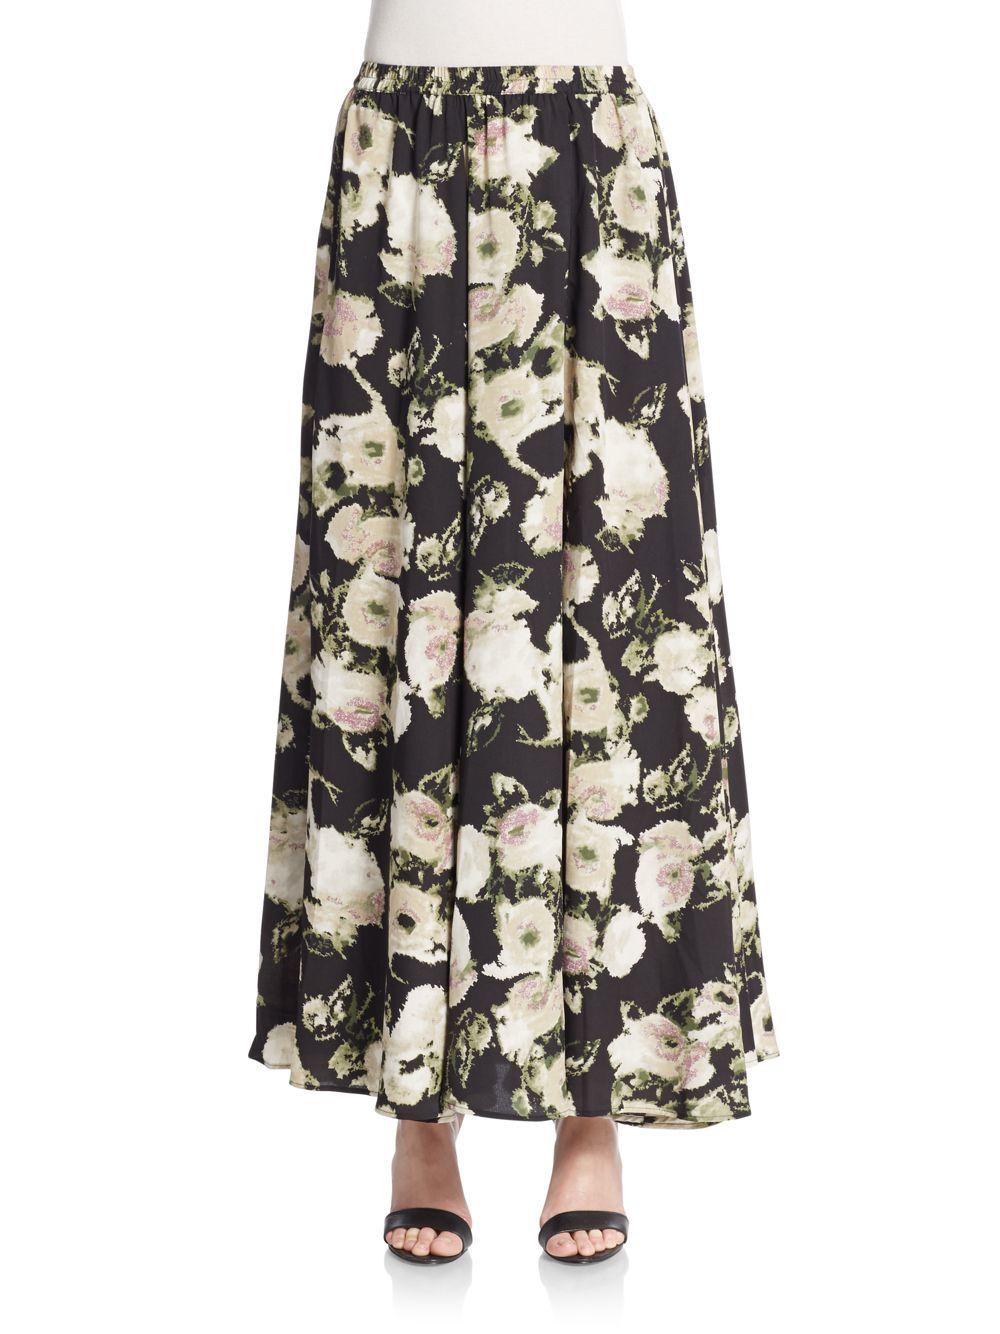 860b658a2 Lucky & Coco Mega Sweep Maxi Skirt in Black - Lyst